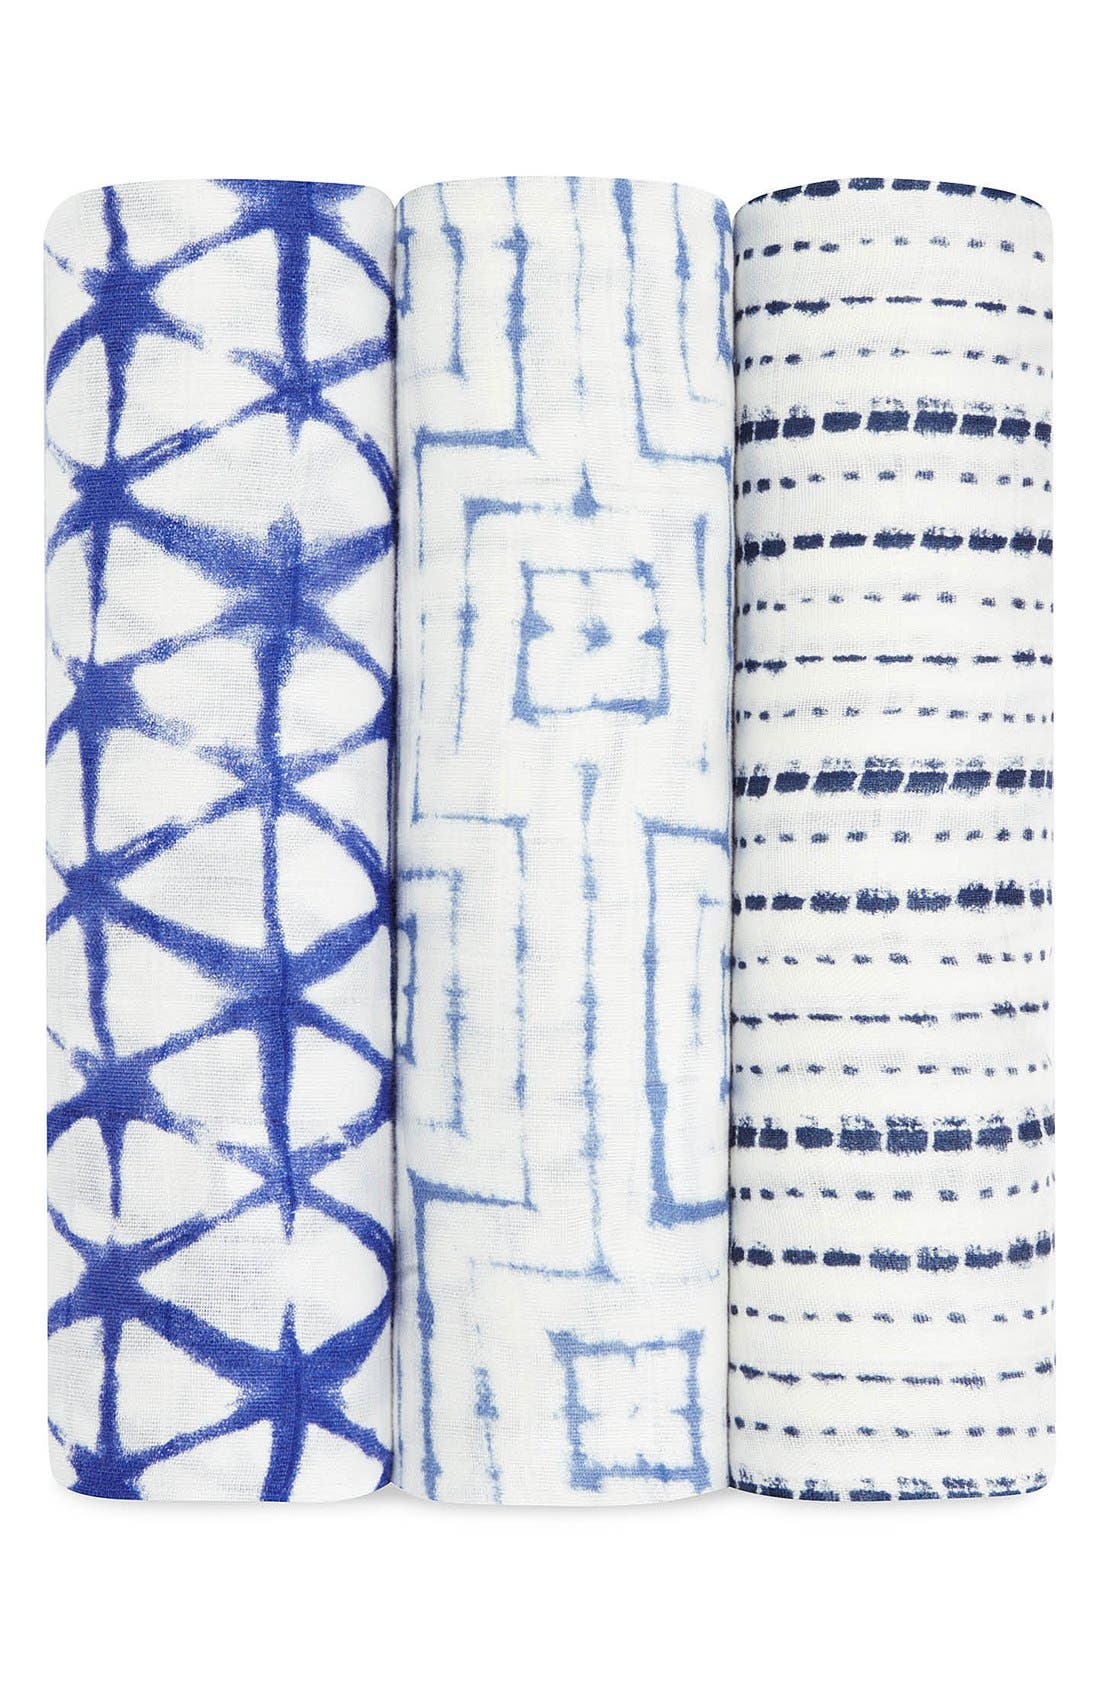 'Silky Soft' Swaddling Cloths,                         Main,                         color, Blue